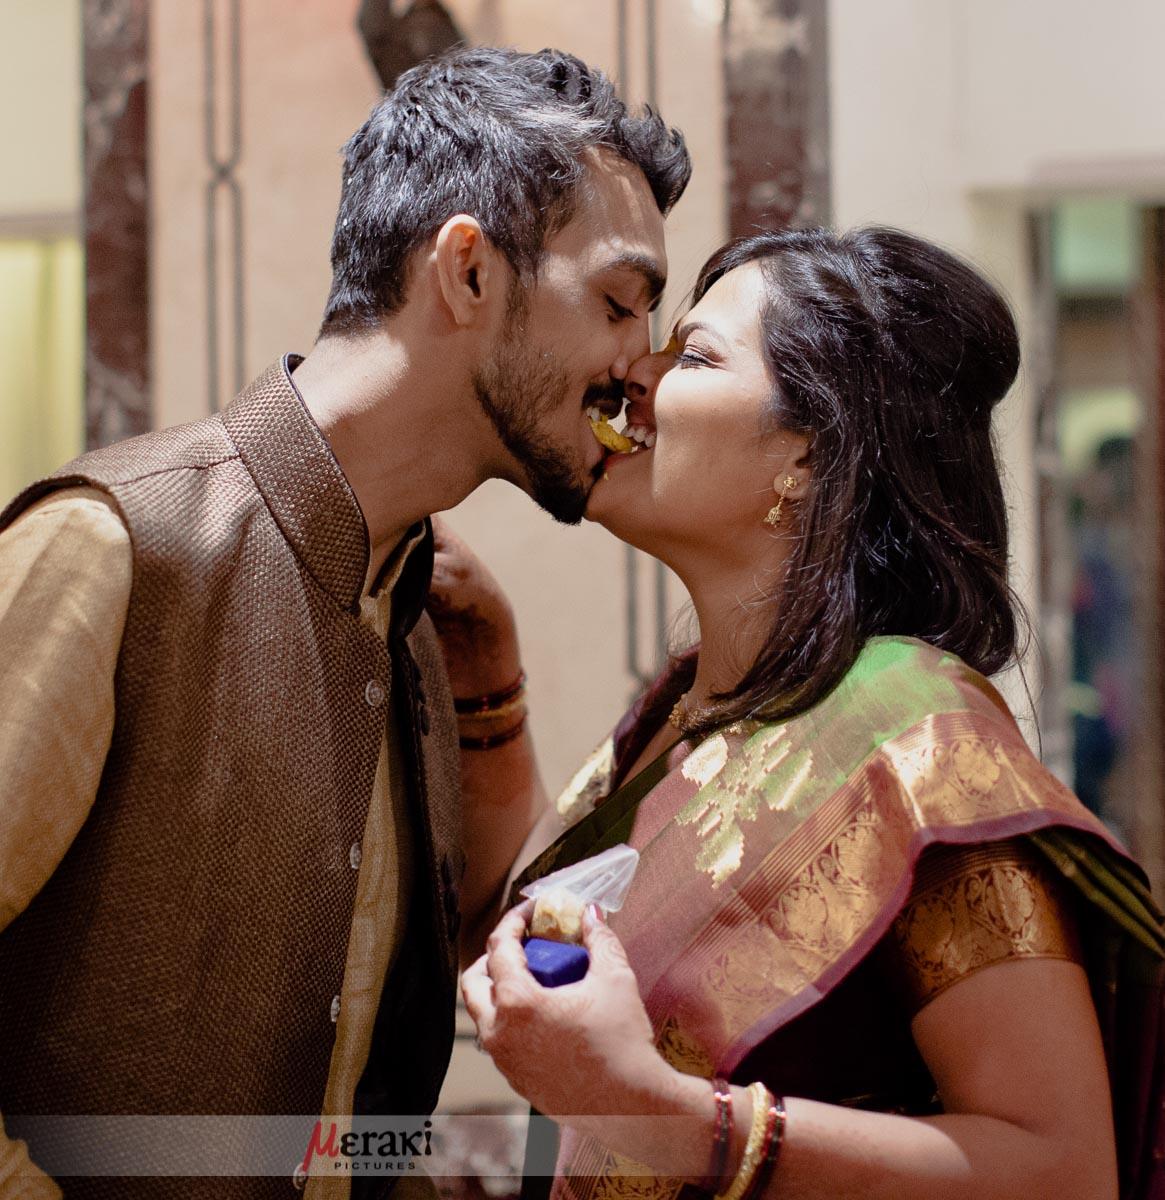 015-_MG_1781-maithili-ajinkya-engagement-portfolio